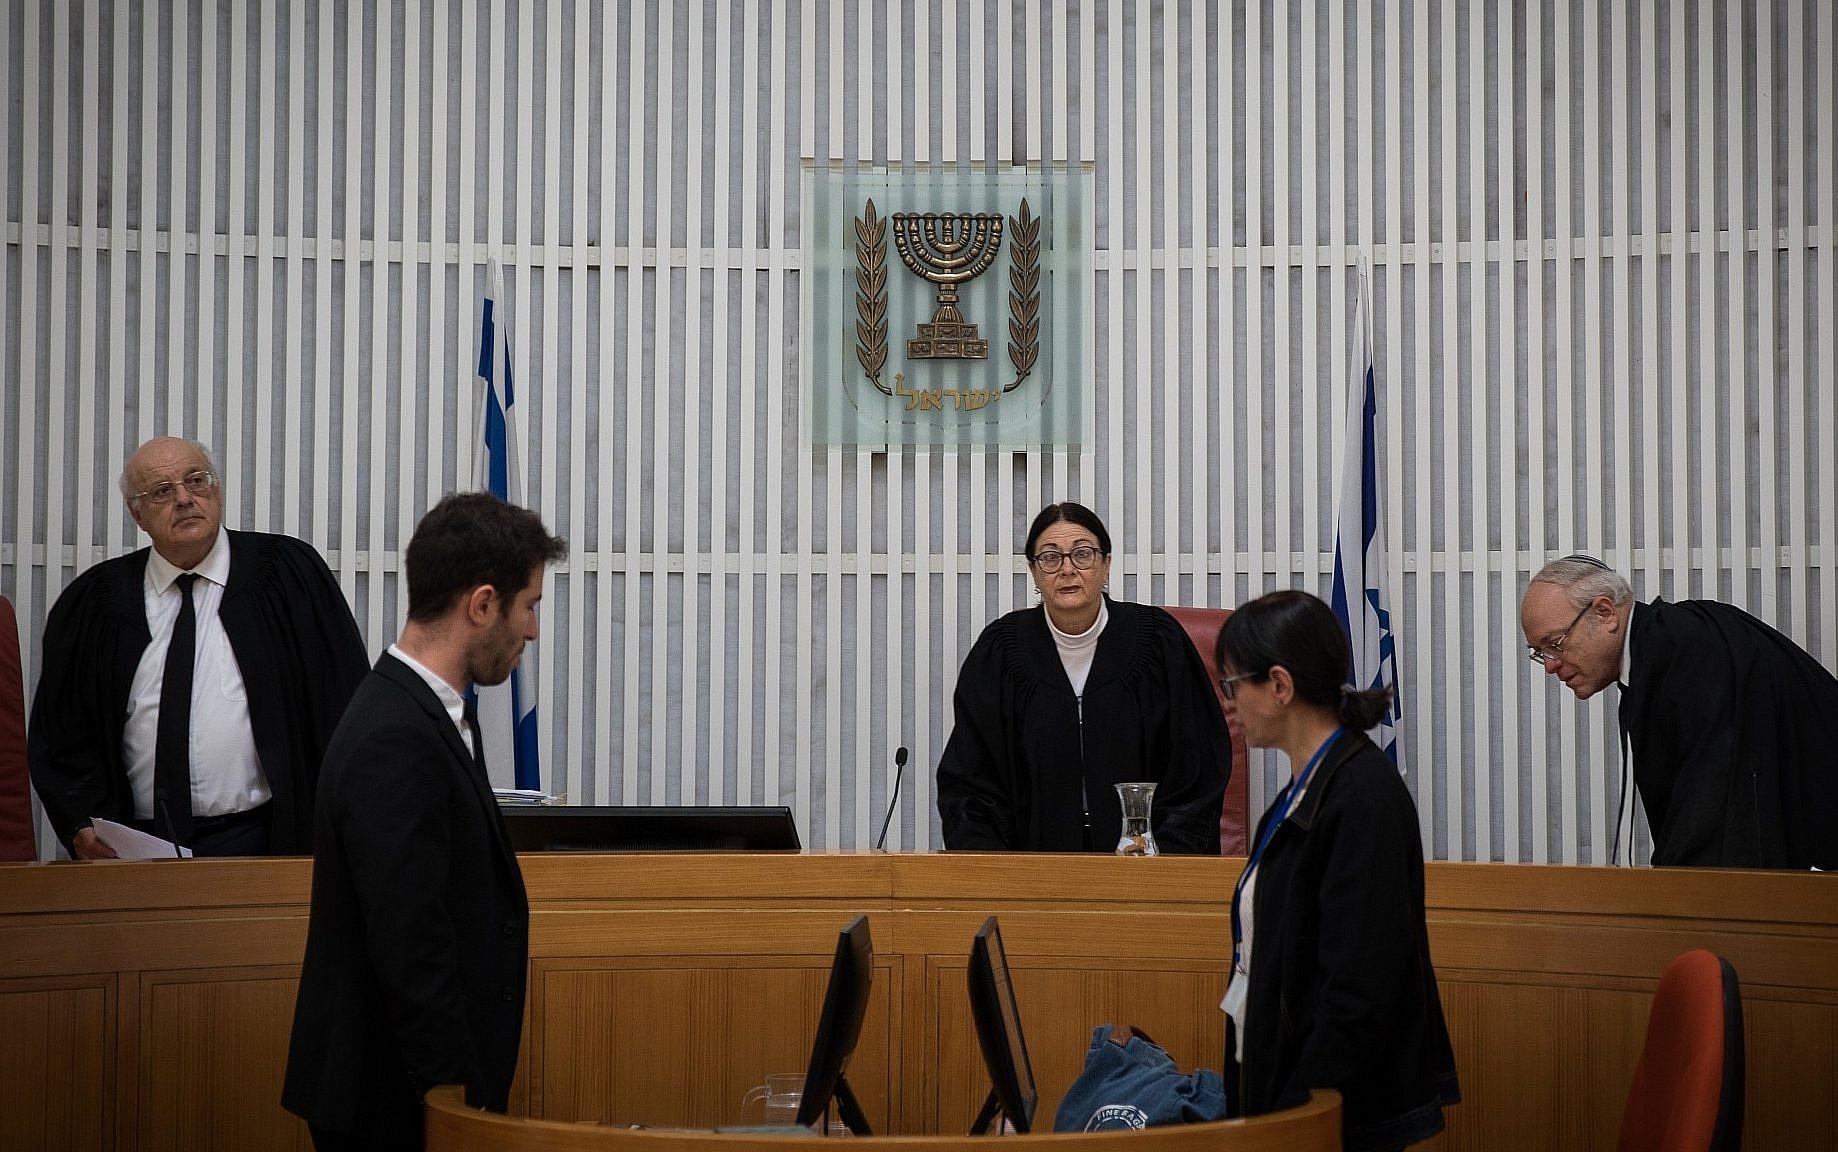 Israel's top court suspends deportation of African asylum seekers